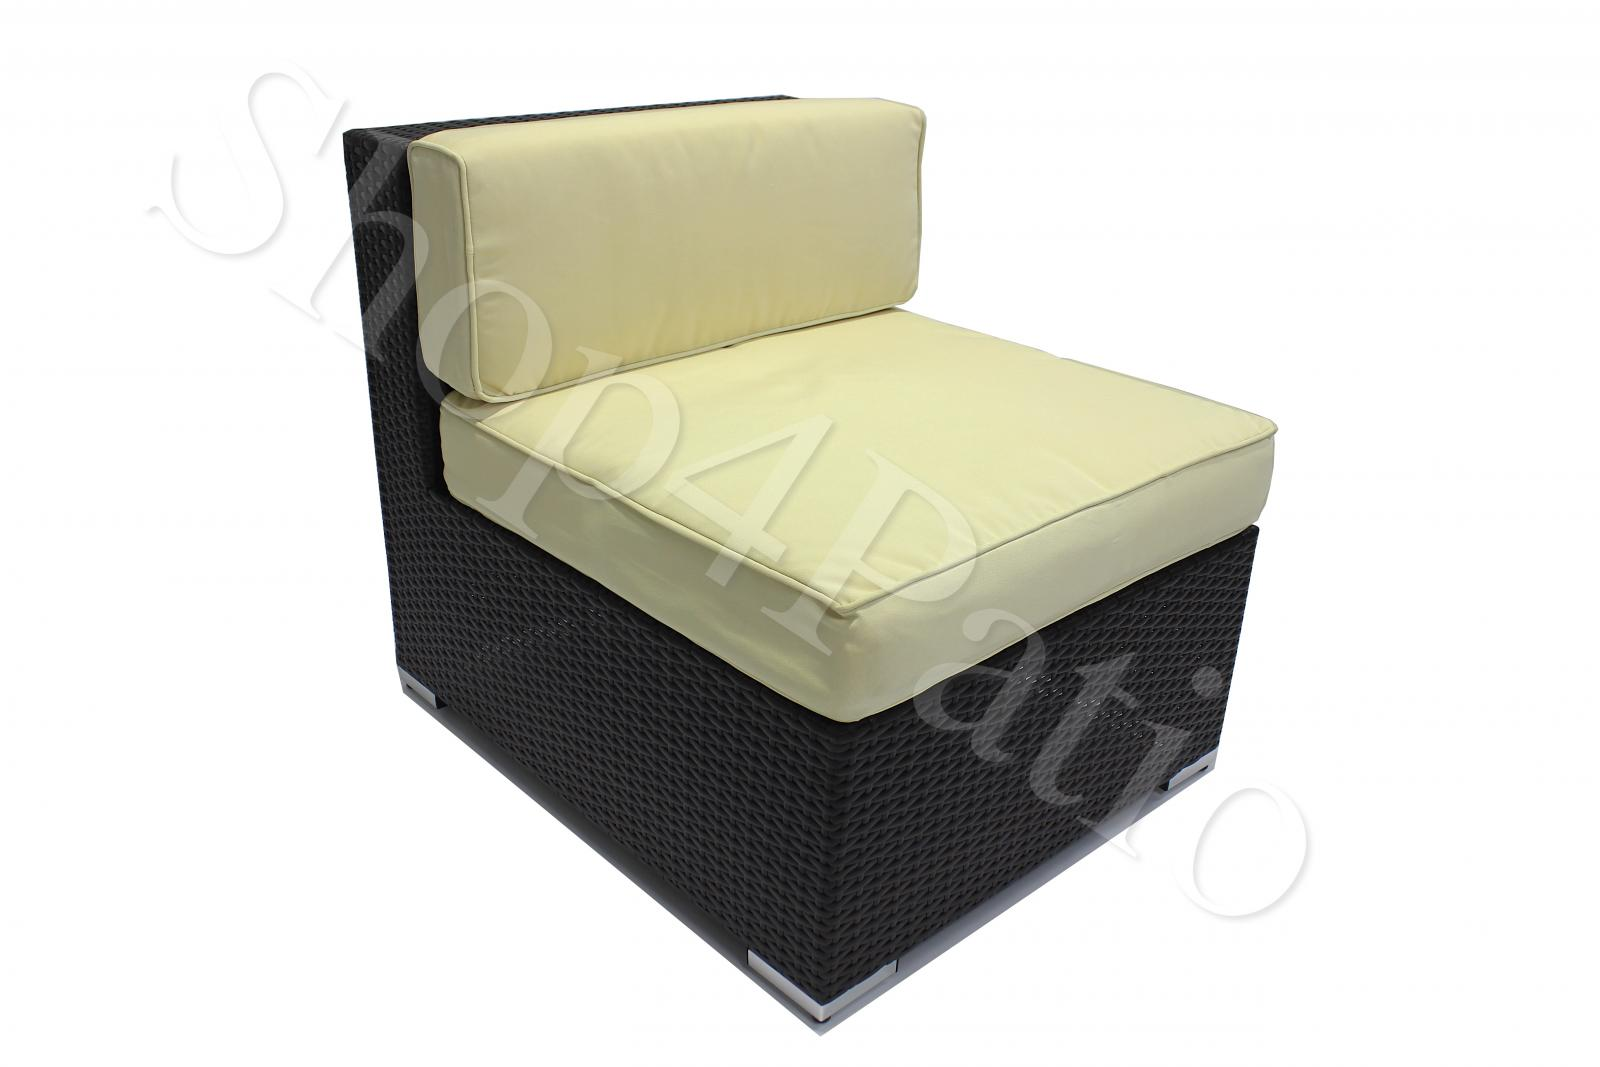 9 piece patio furniture modern garden wicker modular sofa for 9 piece modular sectional sofa